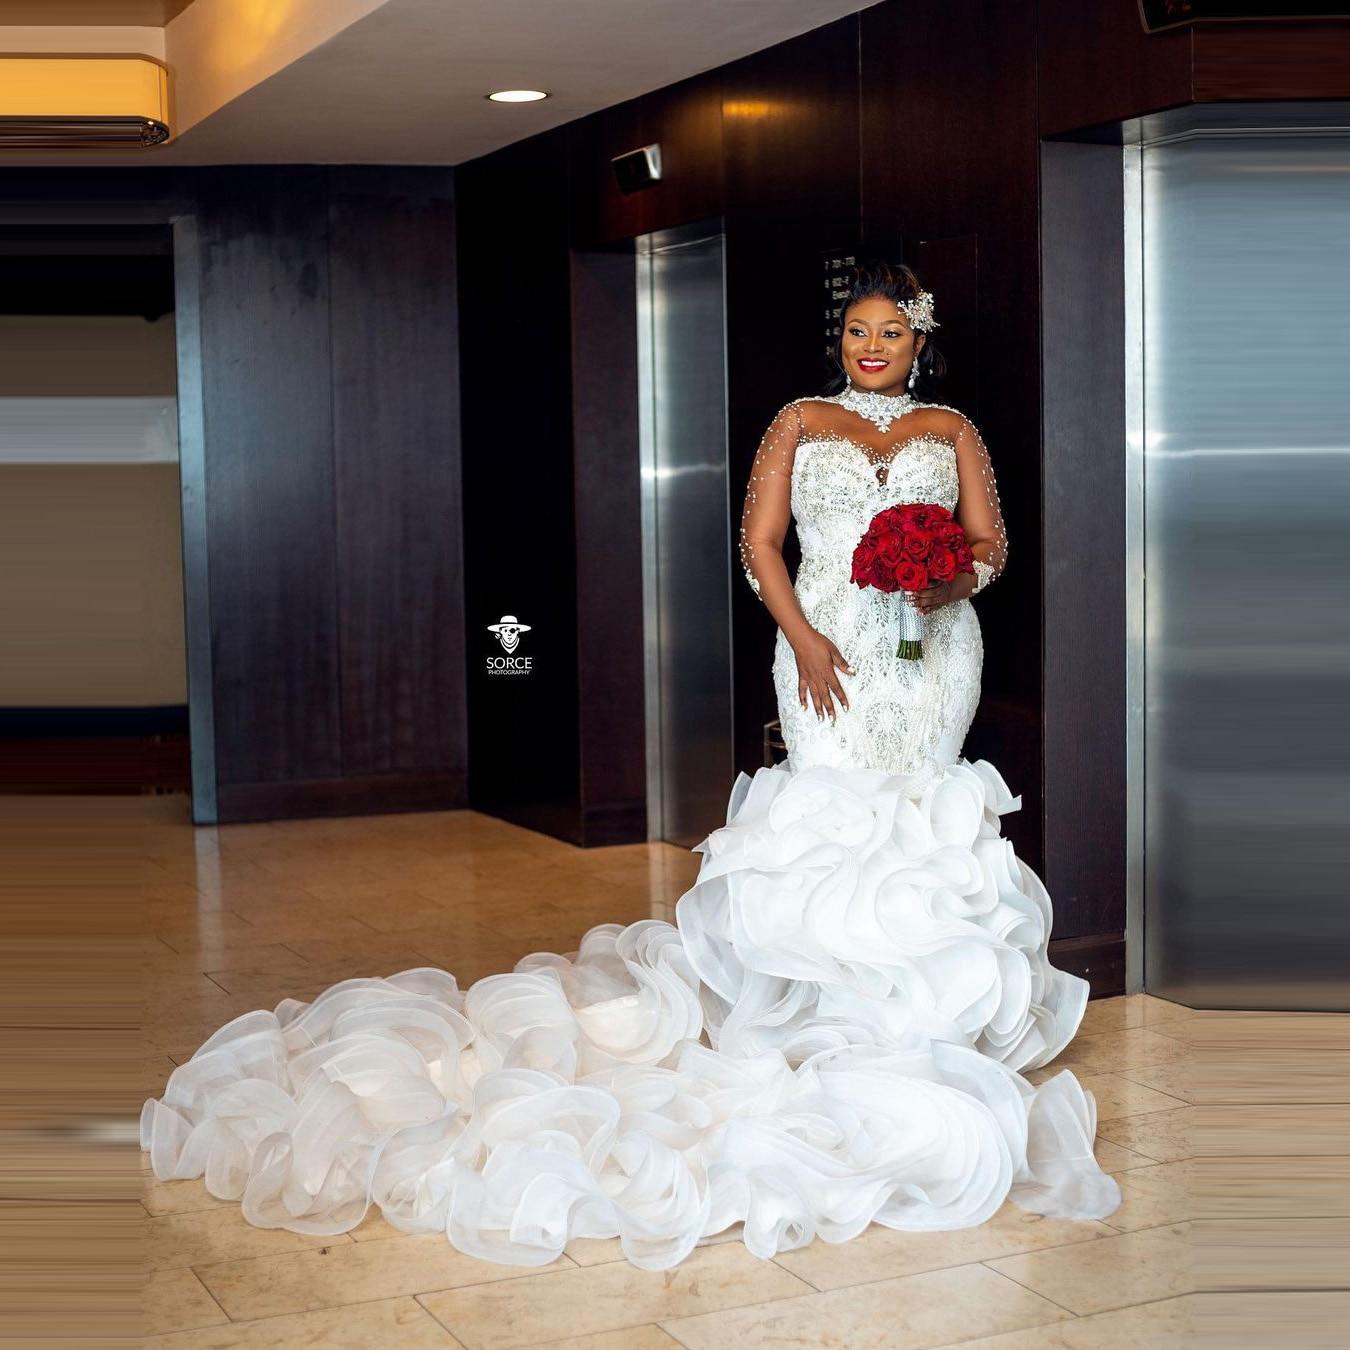 Aso Ebi-فستان زفاف ، مقاس كبير ، ذيل طويل ، كشكش مفلطح ، أكمام طويلة ، ياقة عالية ، كريستال ، خرز ، دانتيل ، ظهر